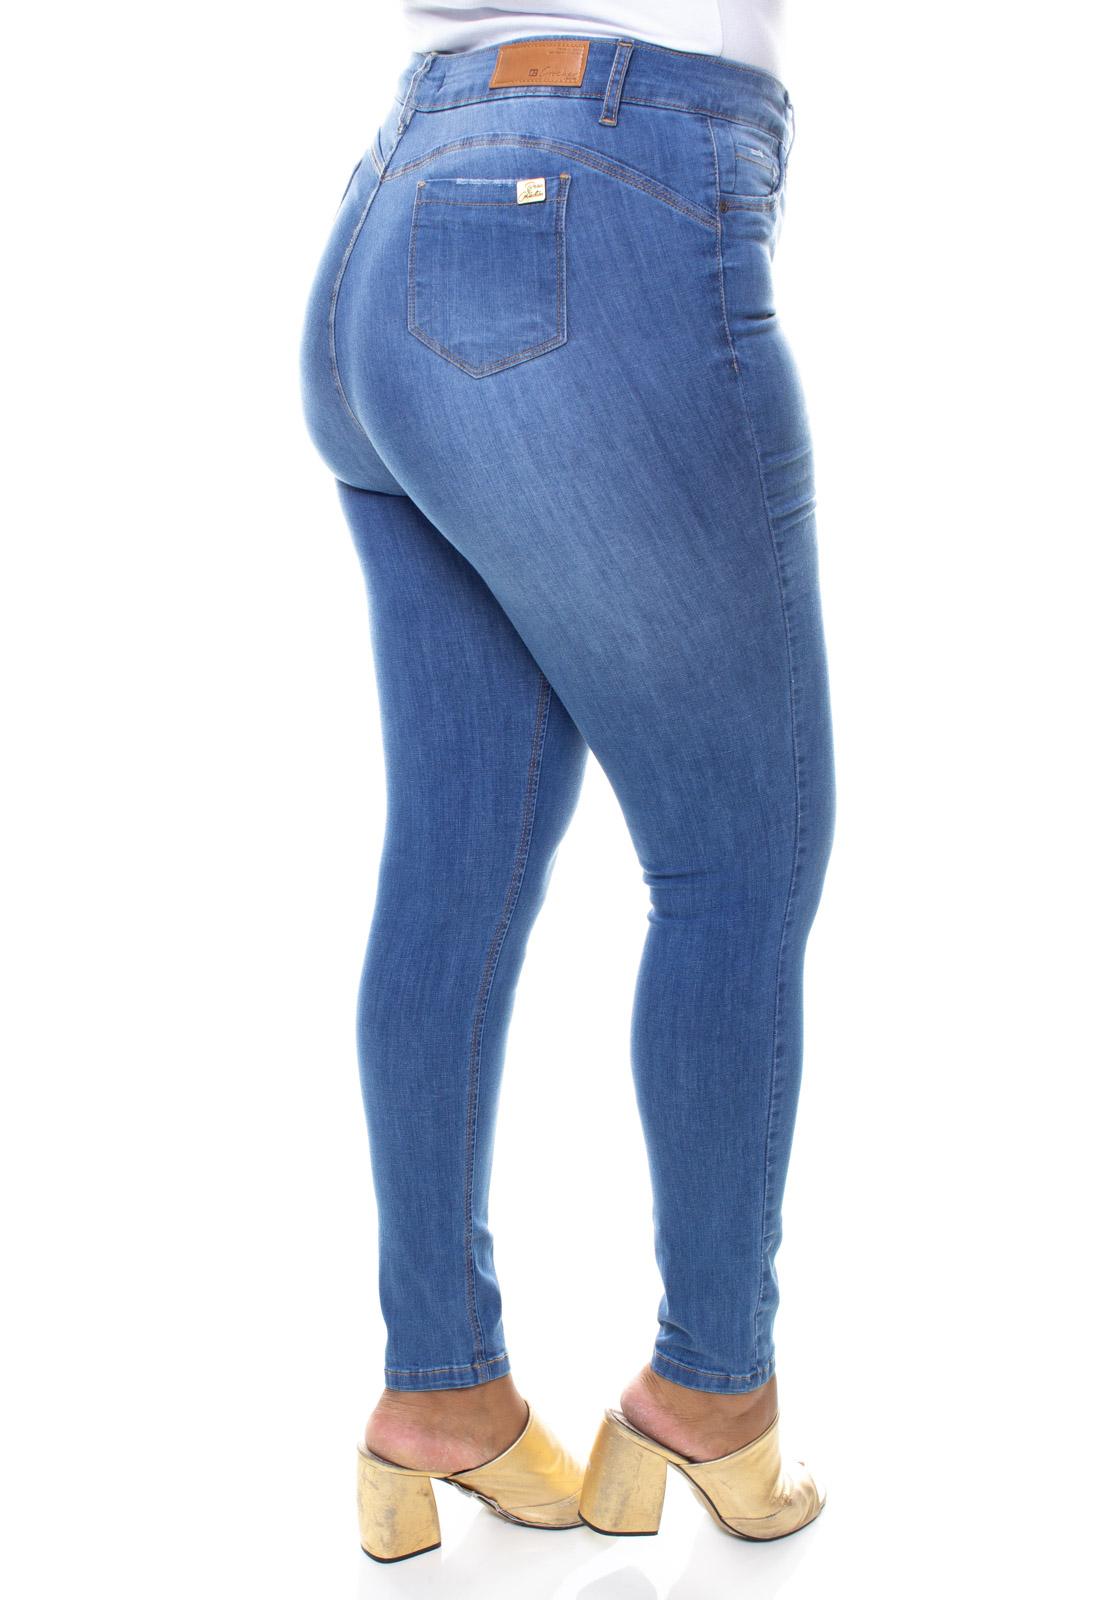 Calça Jeans Plus Size Feminina Skinny Estonada Crocker - 47576  - CROCKER JEANS